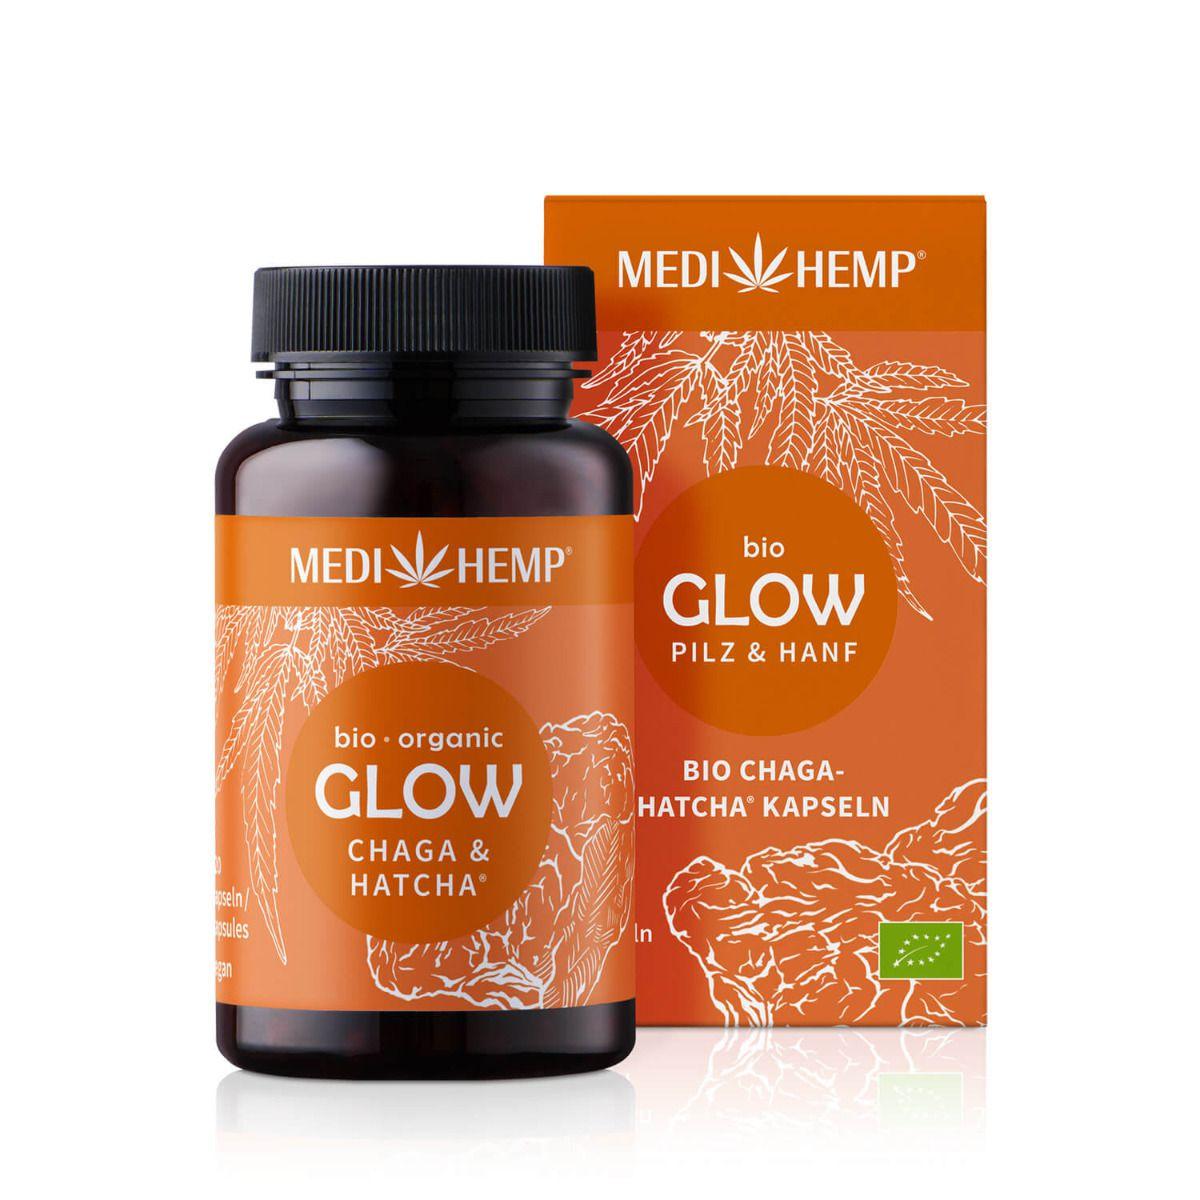 Bio GLOW Chaga-HATCHA® , 120 Kapseln, vegan